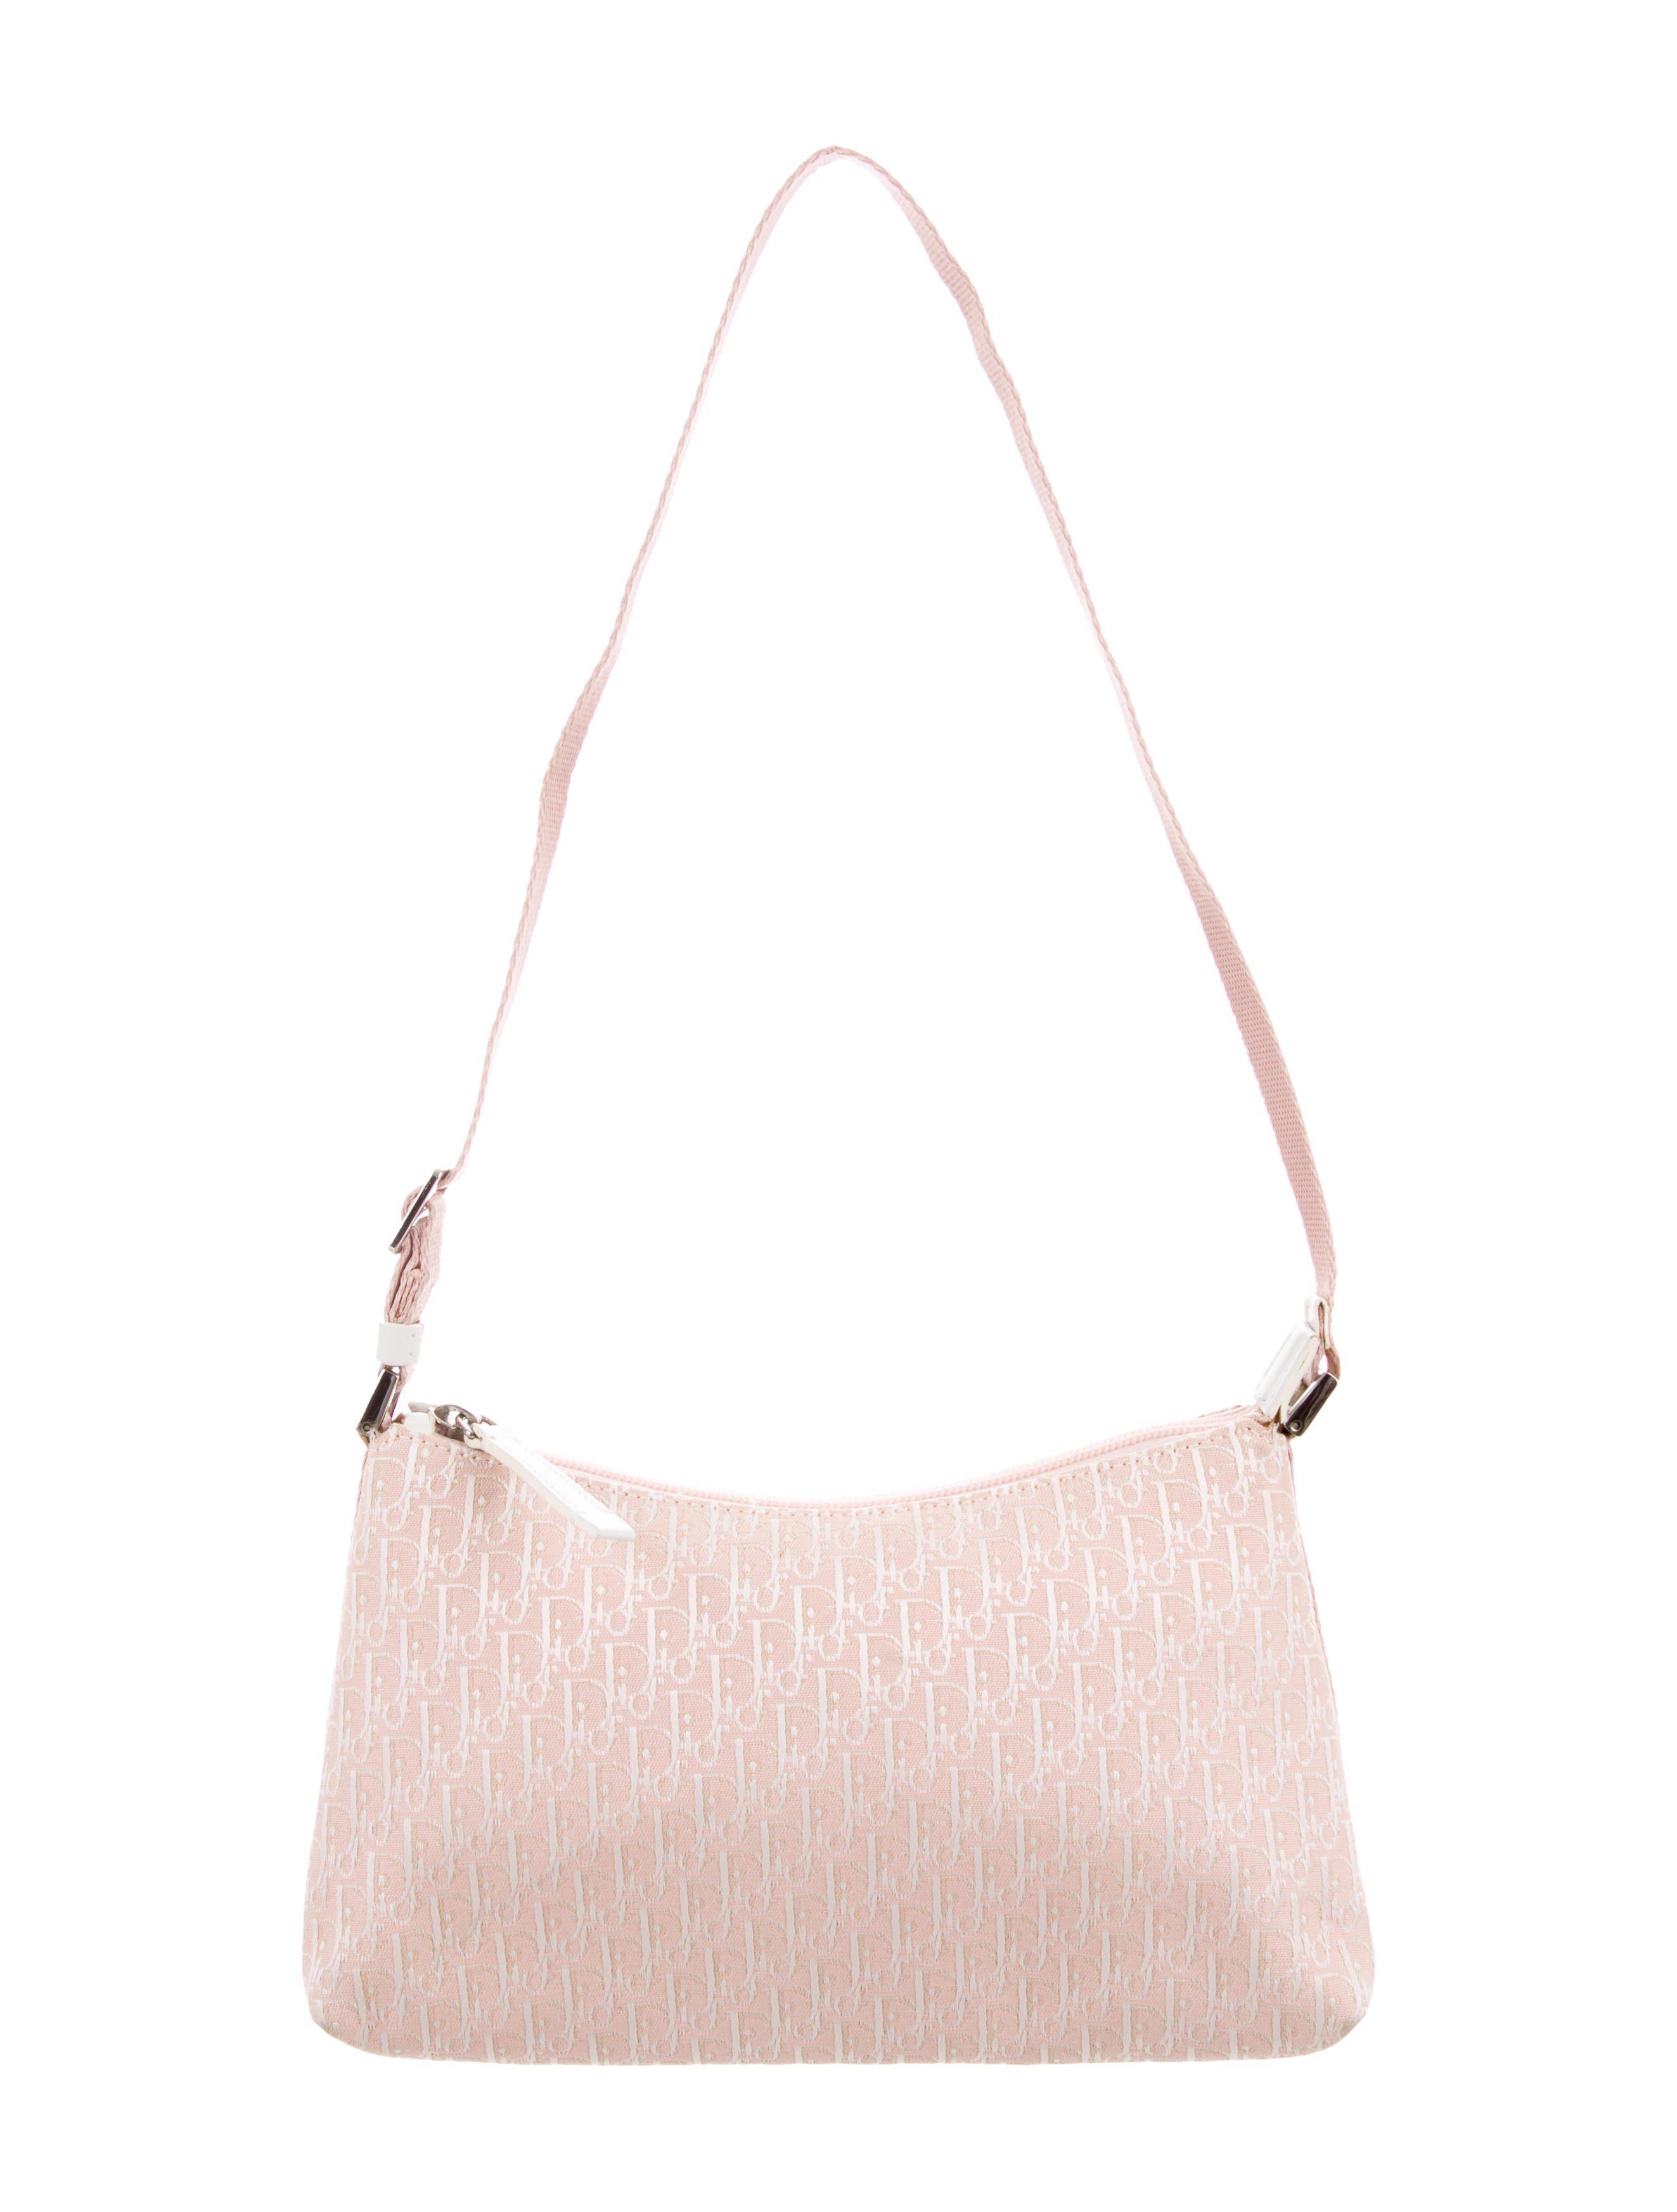 Lyst - Dior Diorissimo Shoulder Bag Pink in Metallic 36778a38f86c6